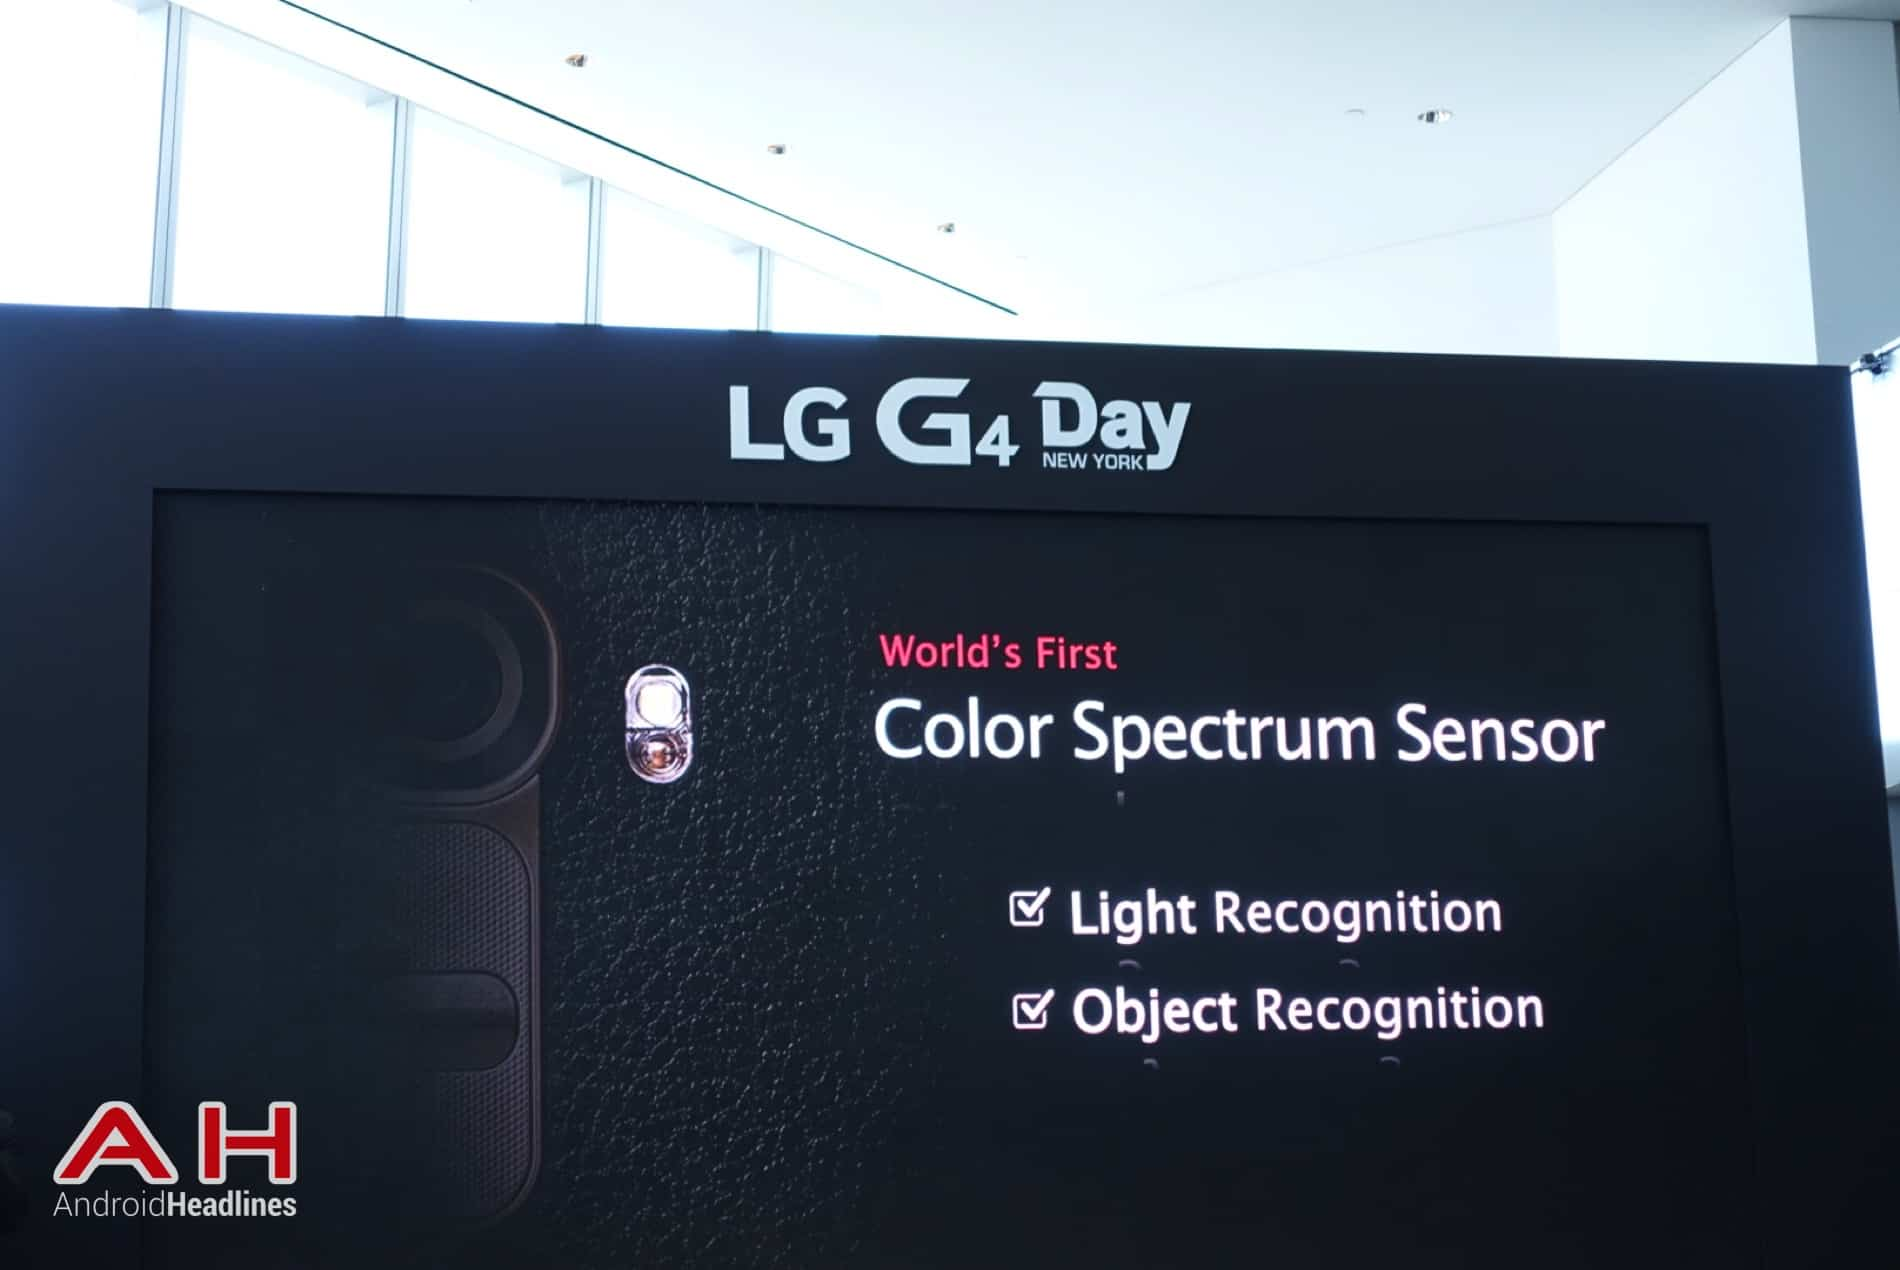 LG G4 Day AH 03 121